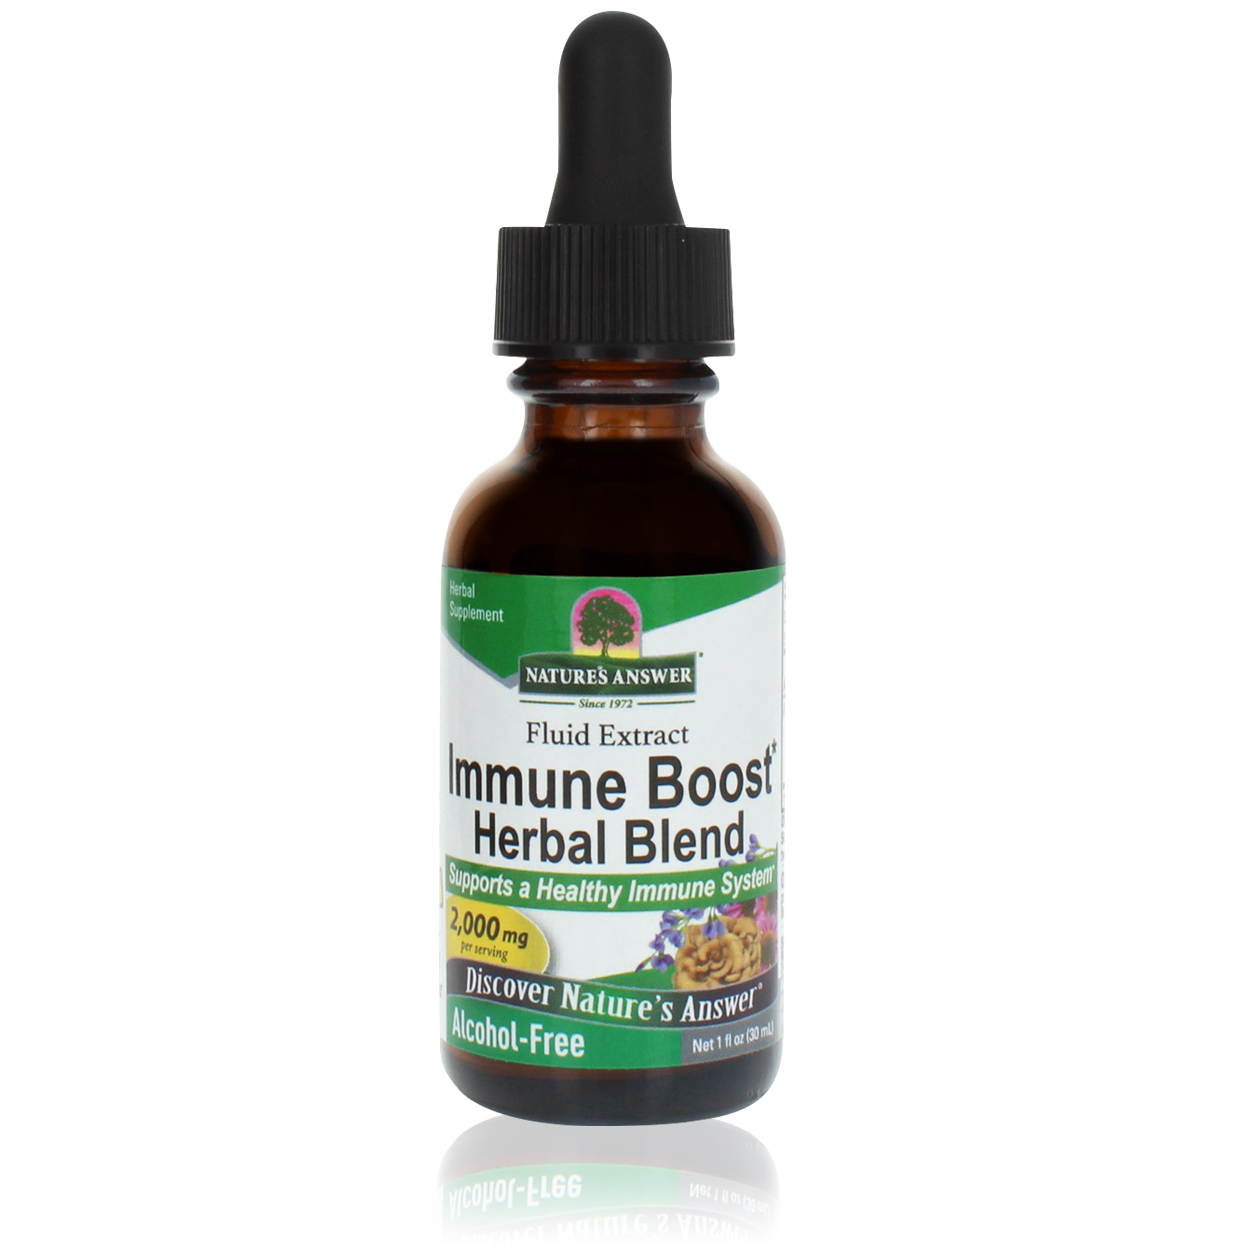 Immune Boost 1oz